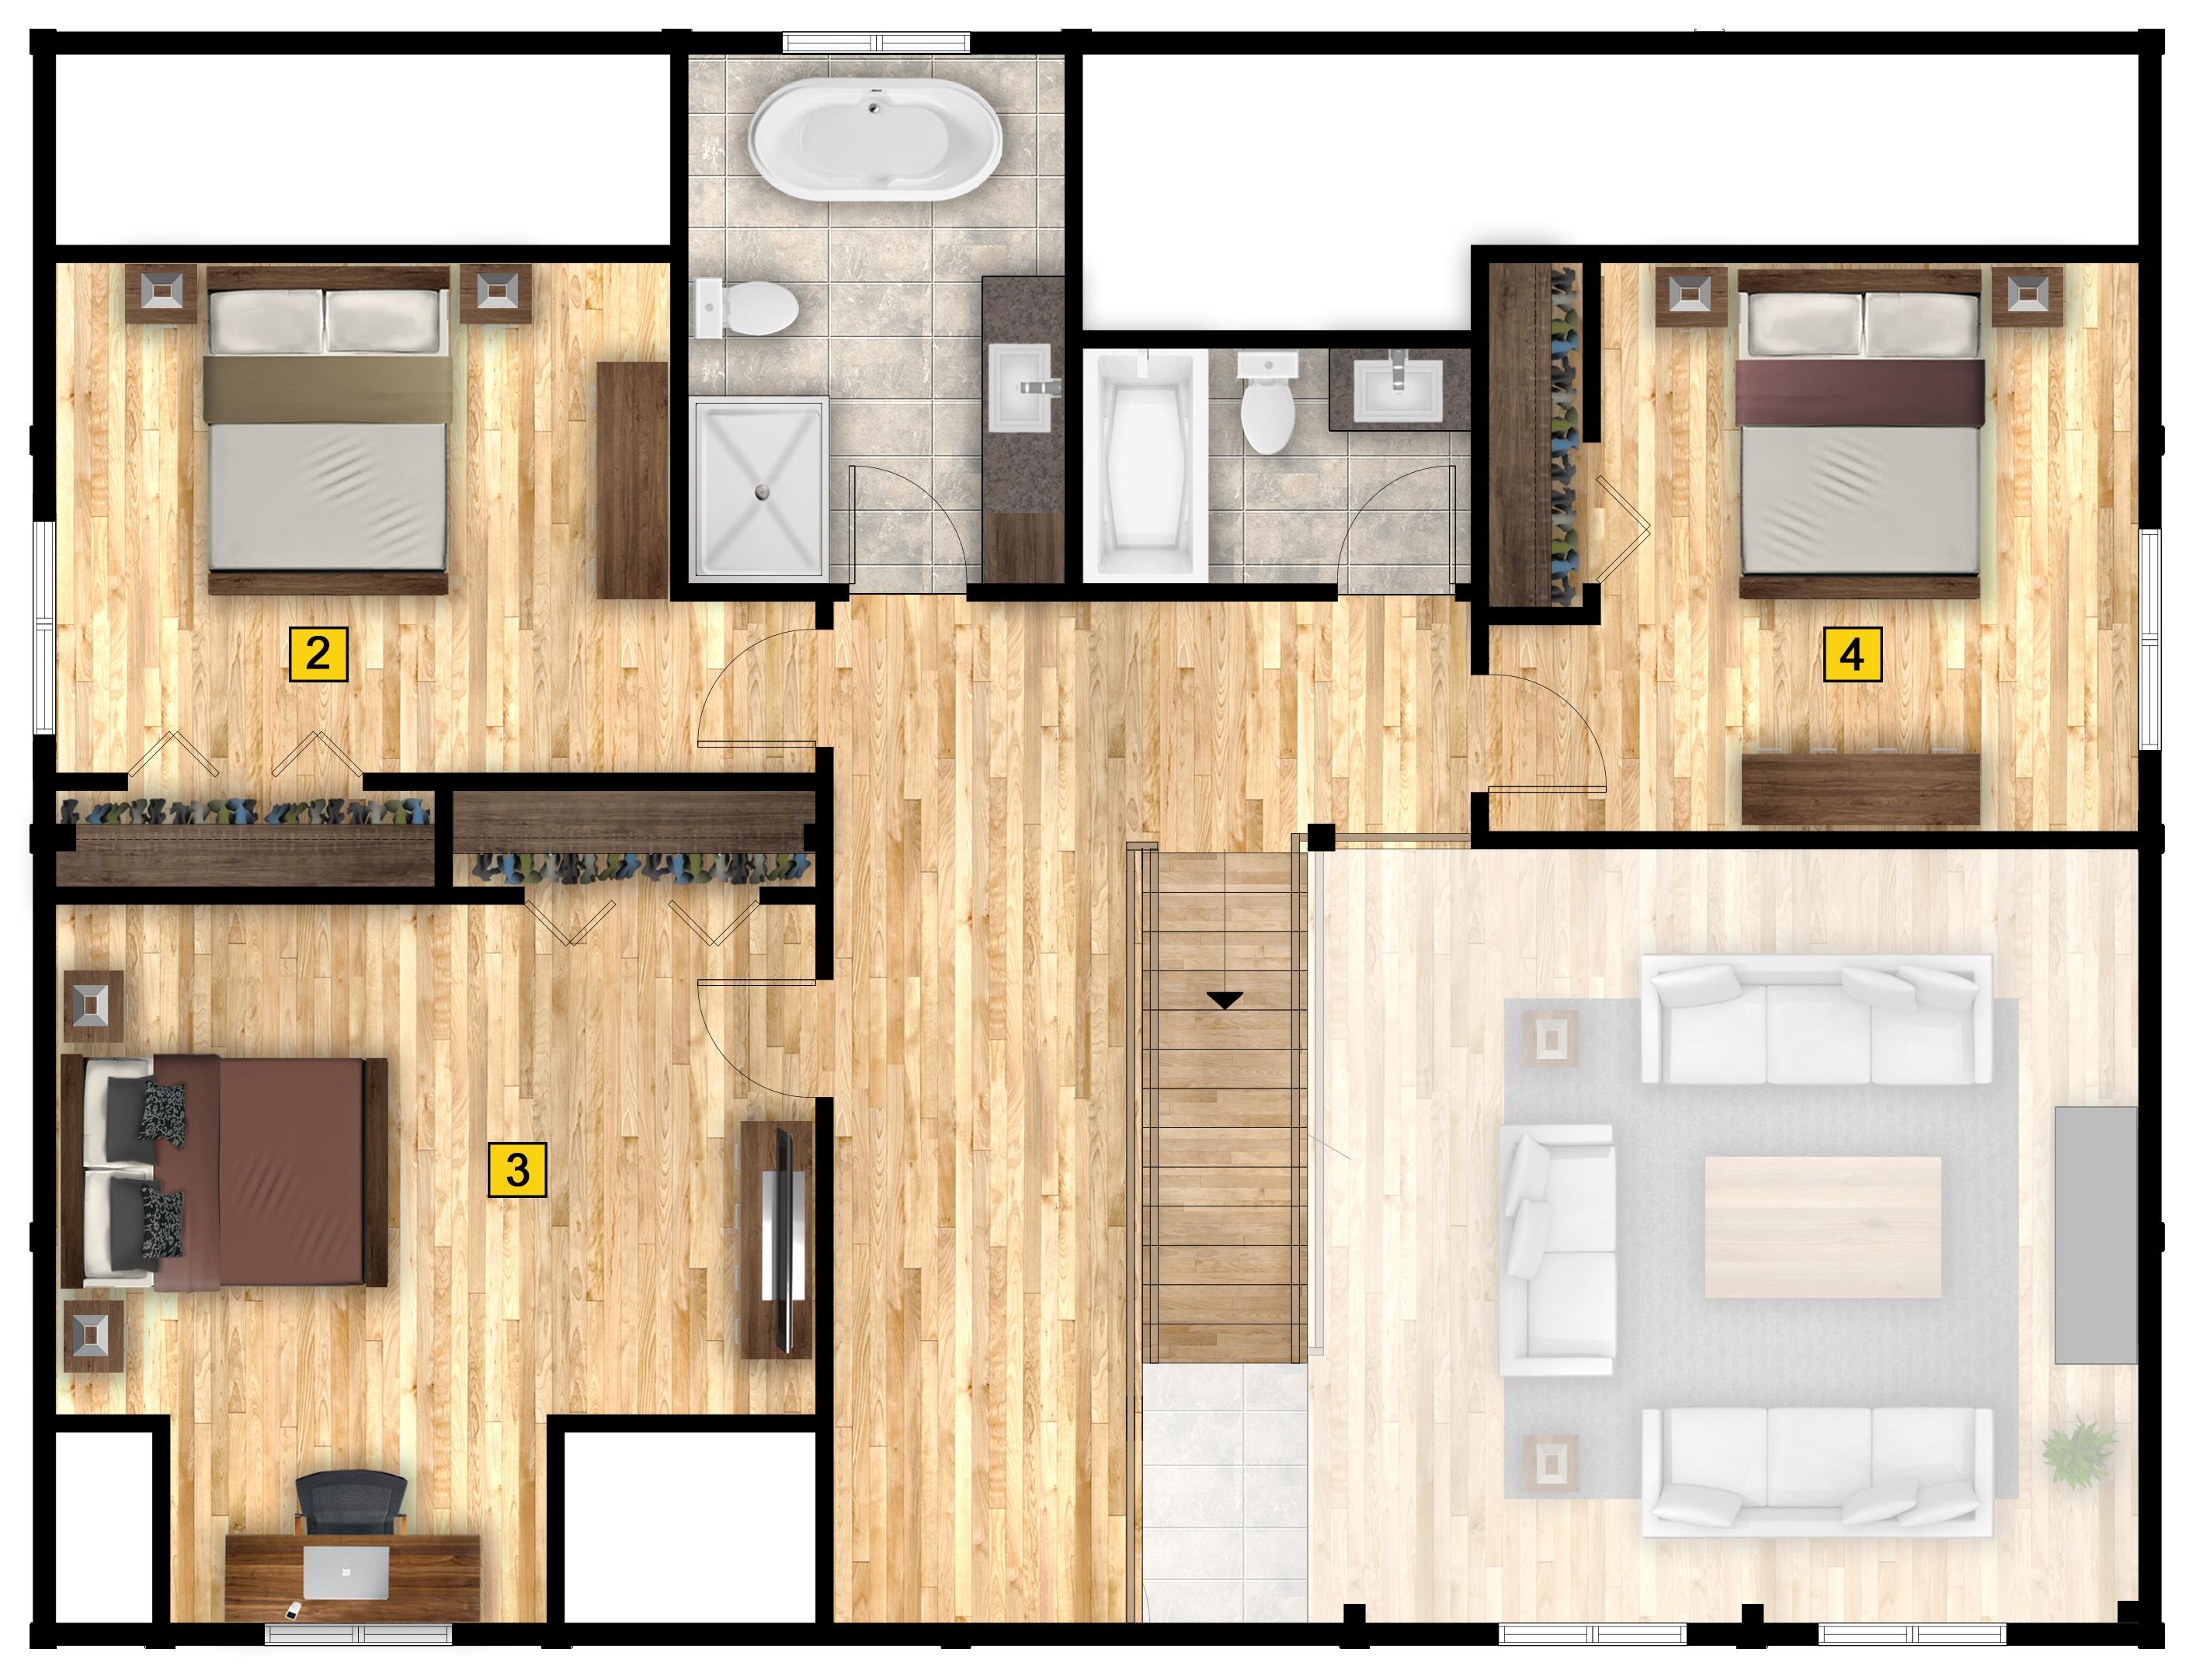 Denali floor plan 2